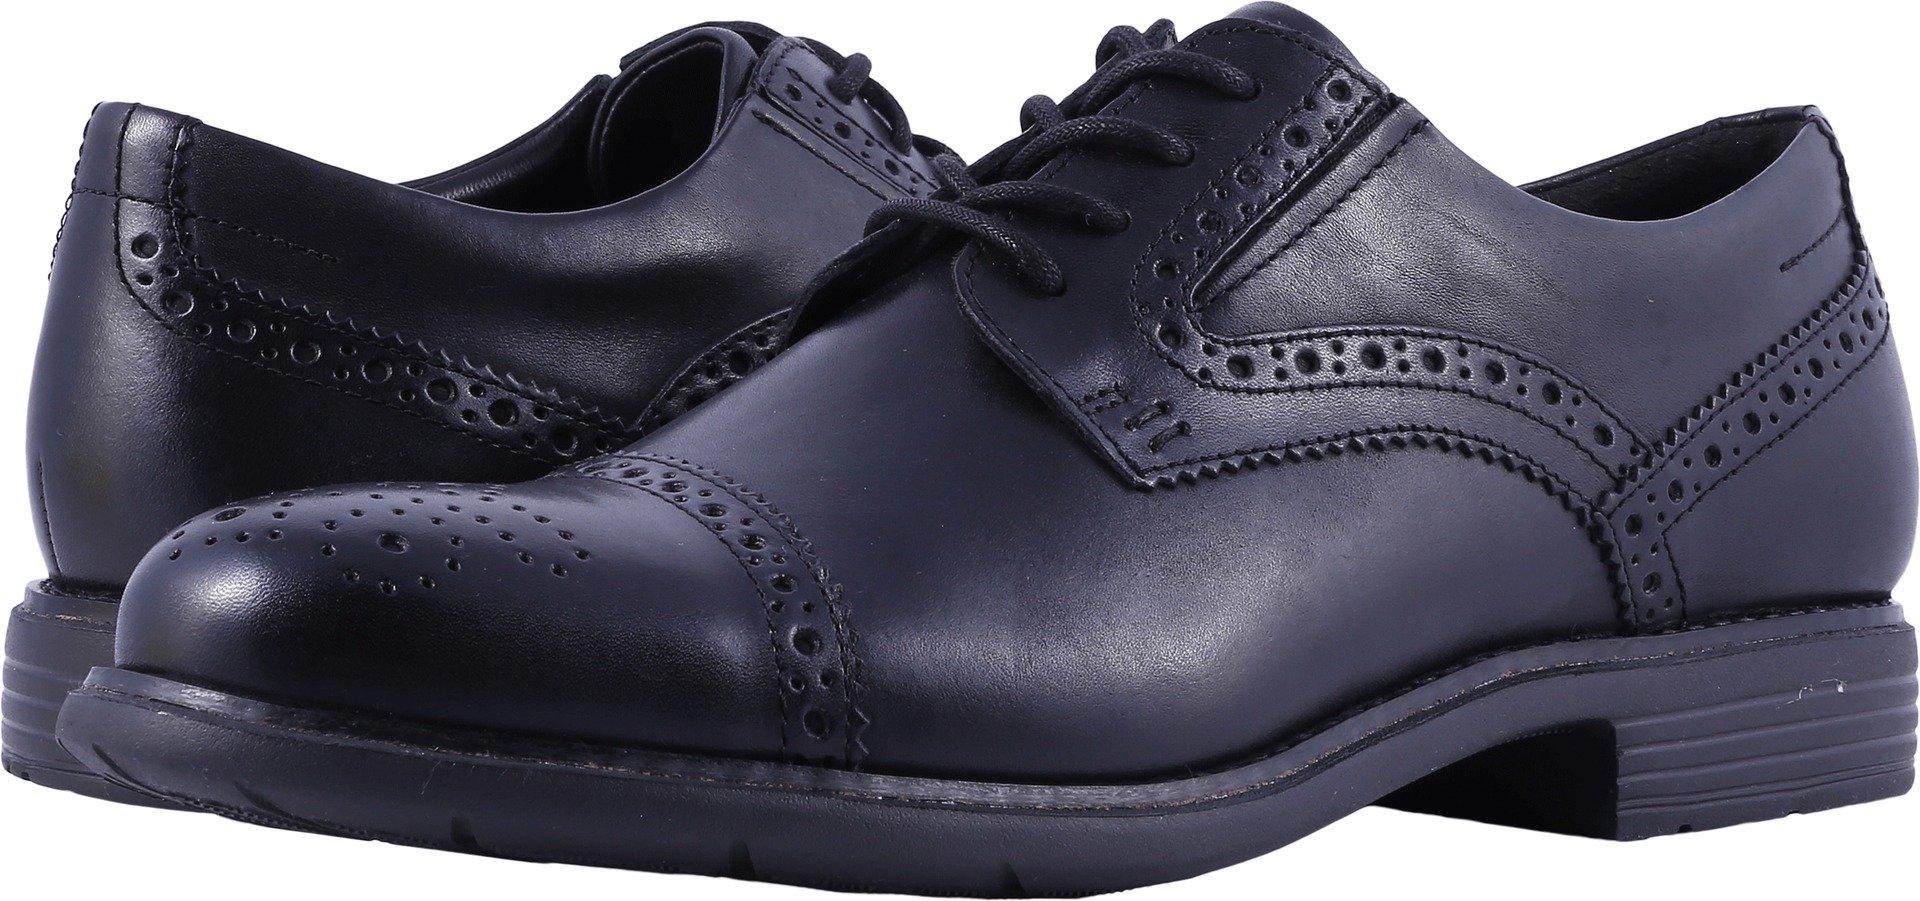 Rockport Men's Total Motion Dress Cap Toe Shoe, black, 8.5 M US